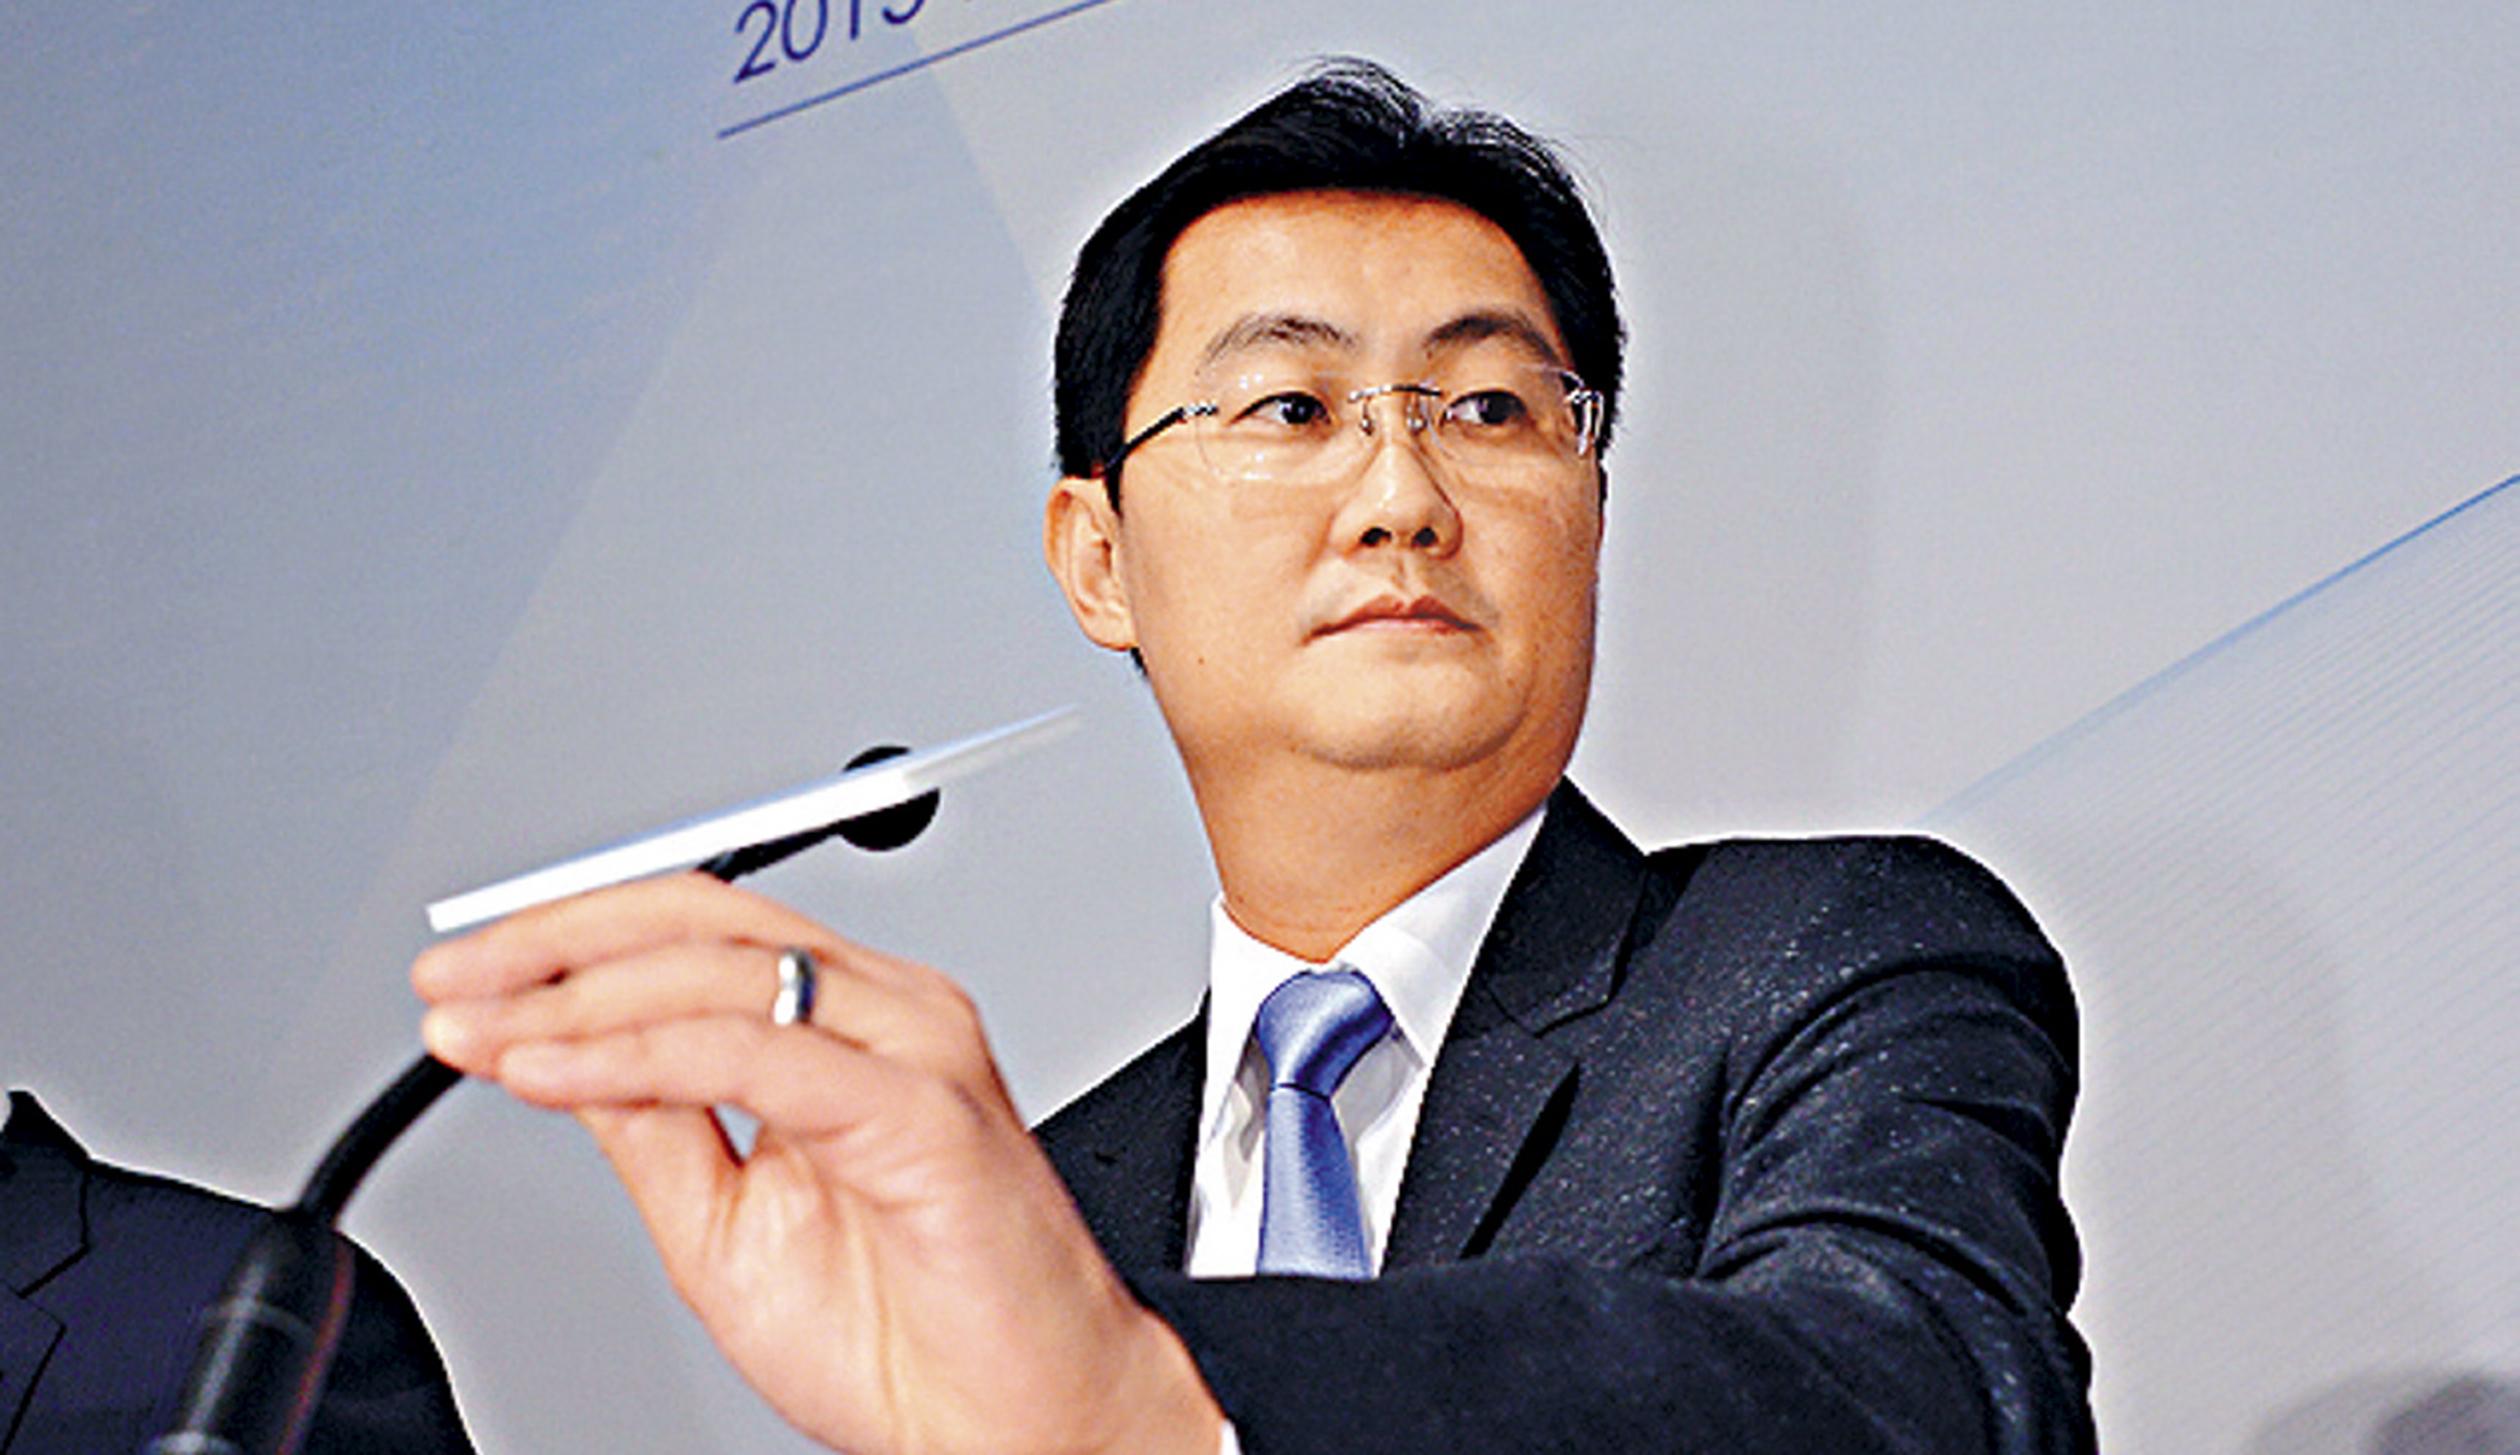 Internet mogul Pony Ma named most generous Chinese philanthropist